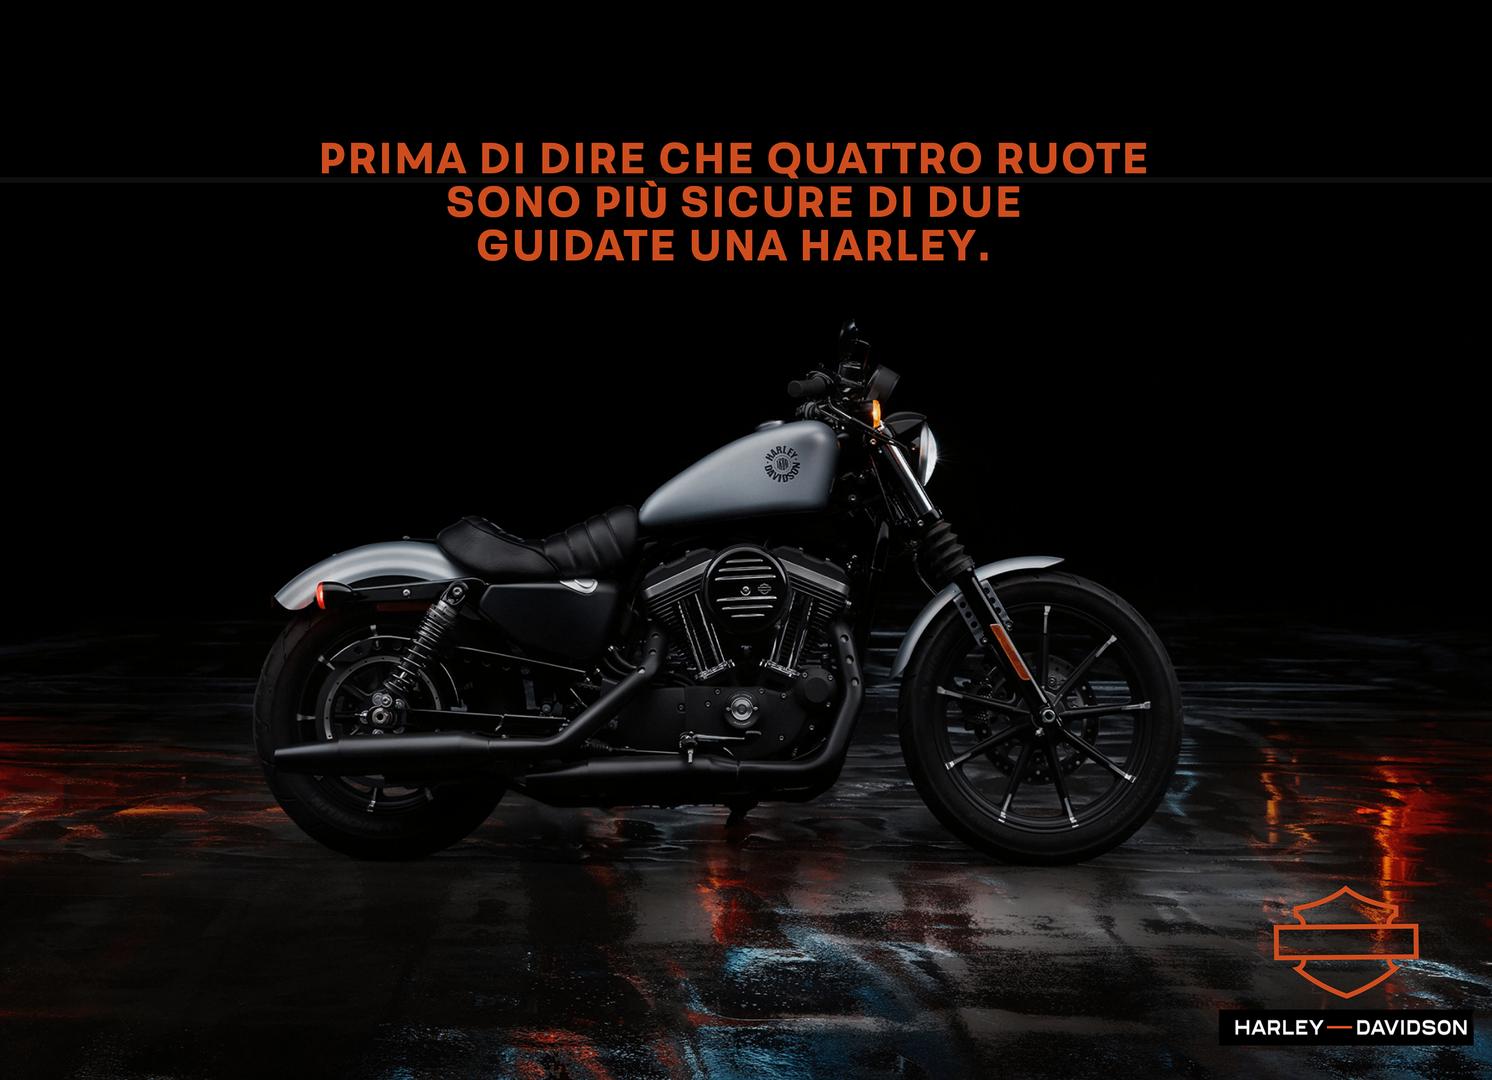 Print | Digital Ad